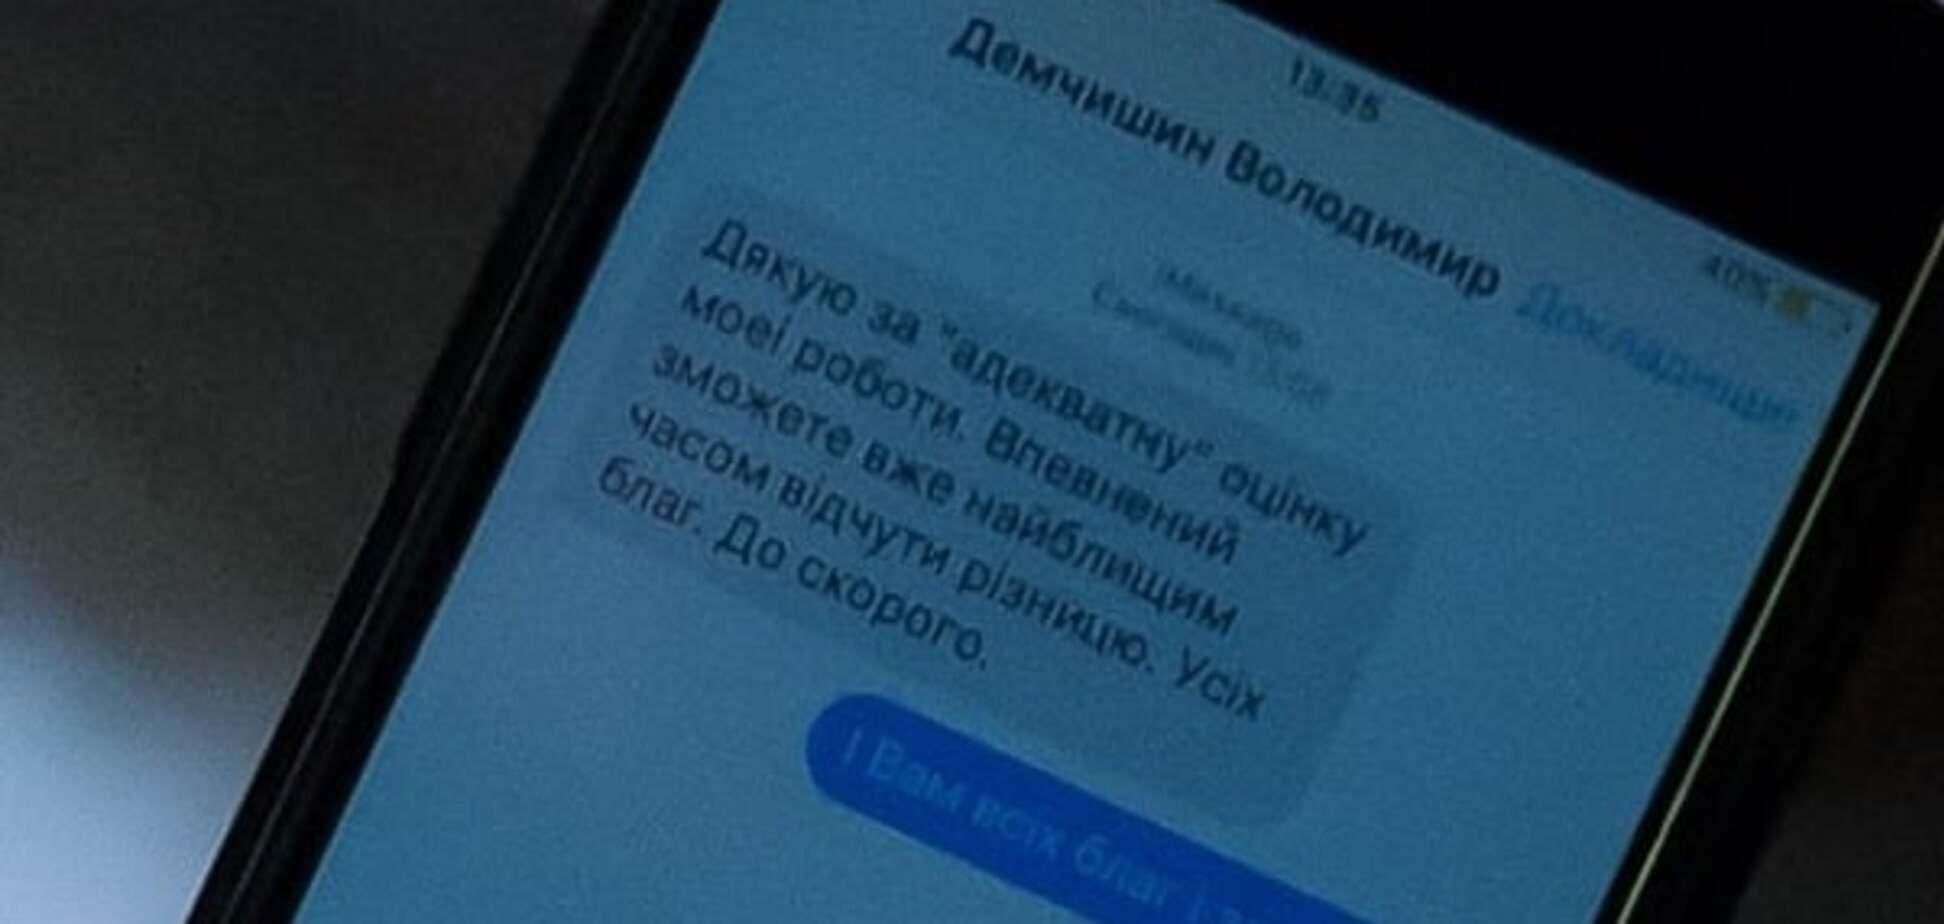 СМС Демчишина